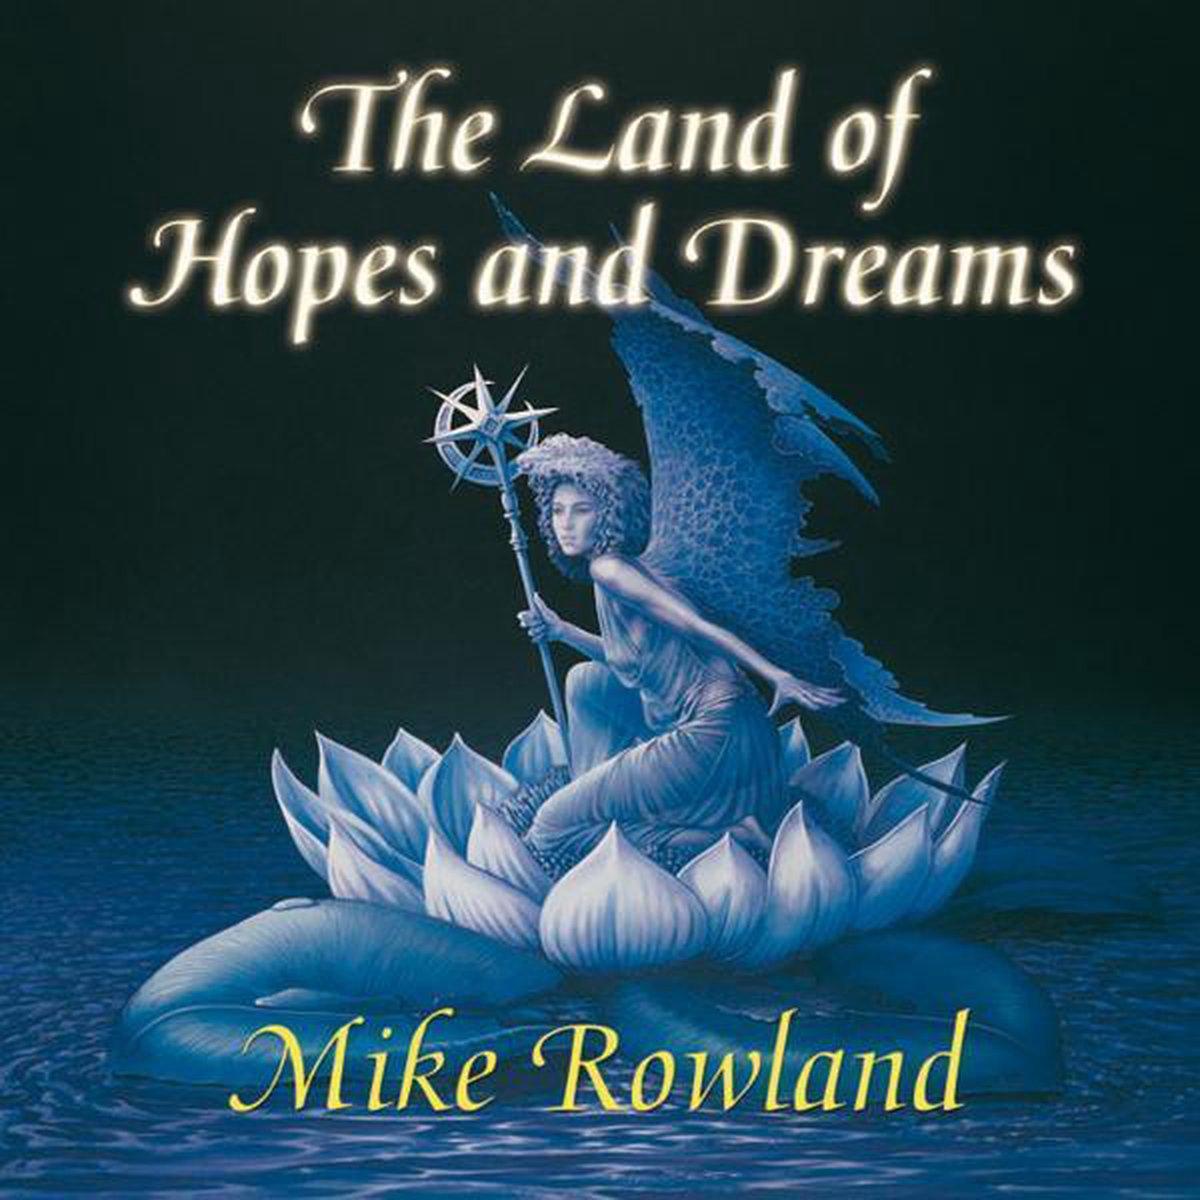 The Land Of Hopes And Dreams - Marshall Rowland